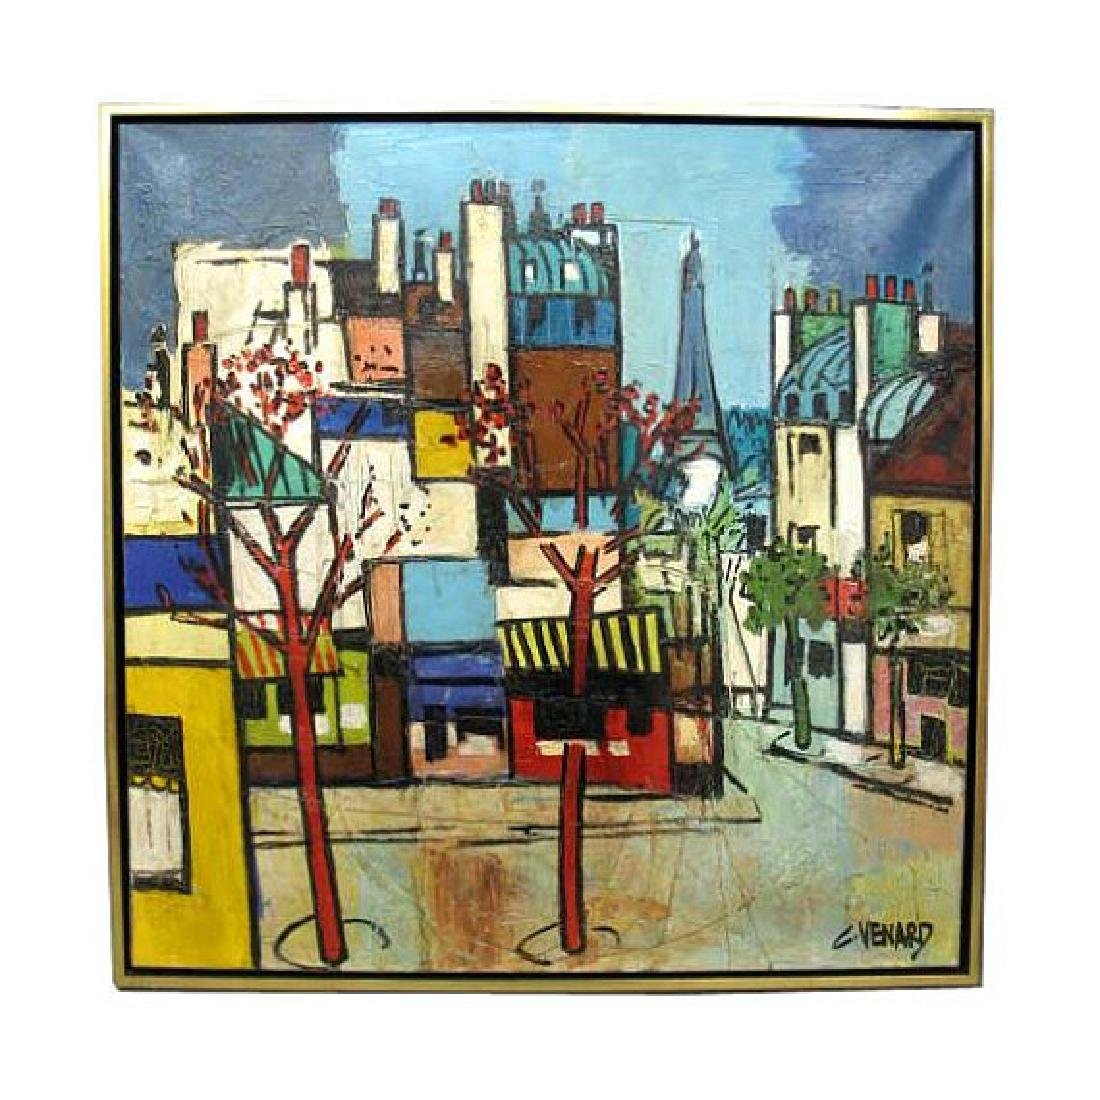 Authentic Claude Venard Modern Impressionist Eiffel